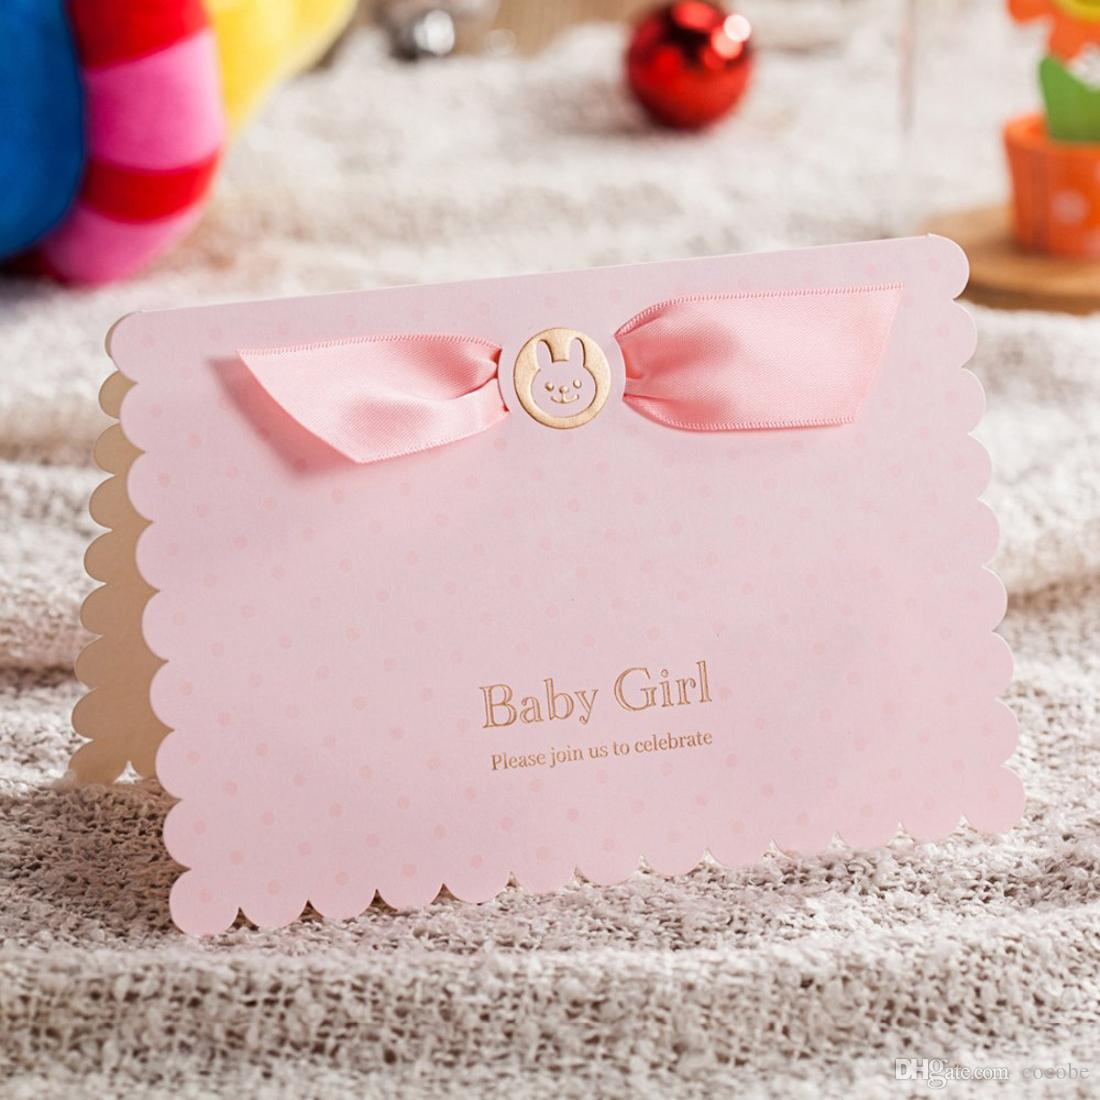 Wishmade Pink Blue Baby Shower Invitation Cards With Cute Baby Car Invites Card Kit For Boy Girl Birthday Cw5301 Handmade Wedding Invitation Handmade